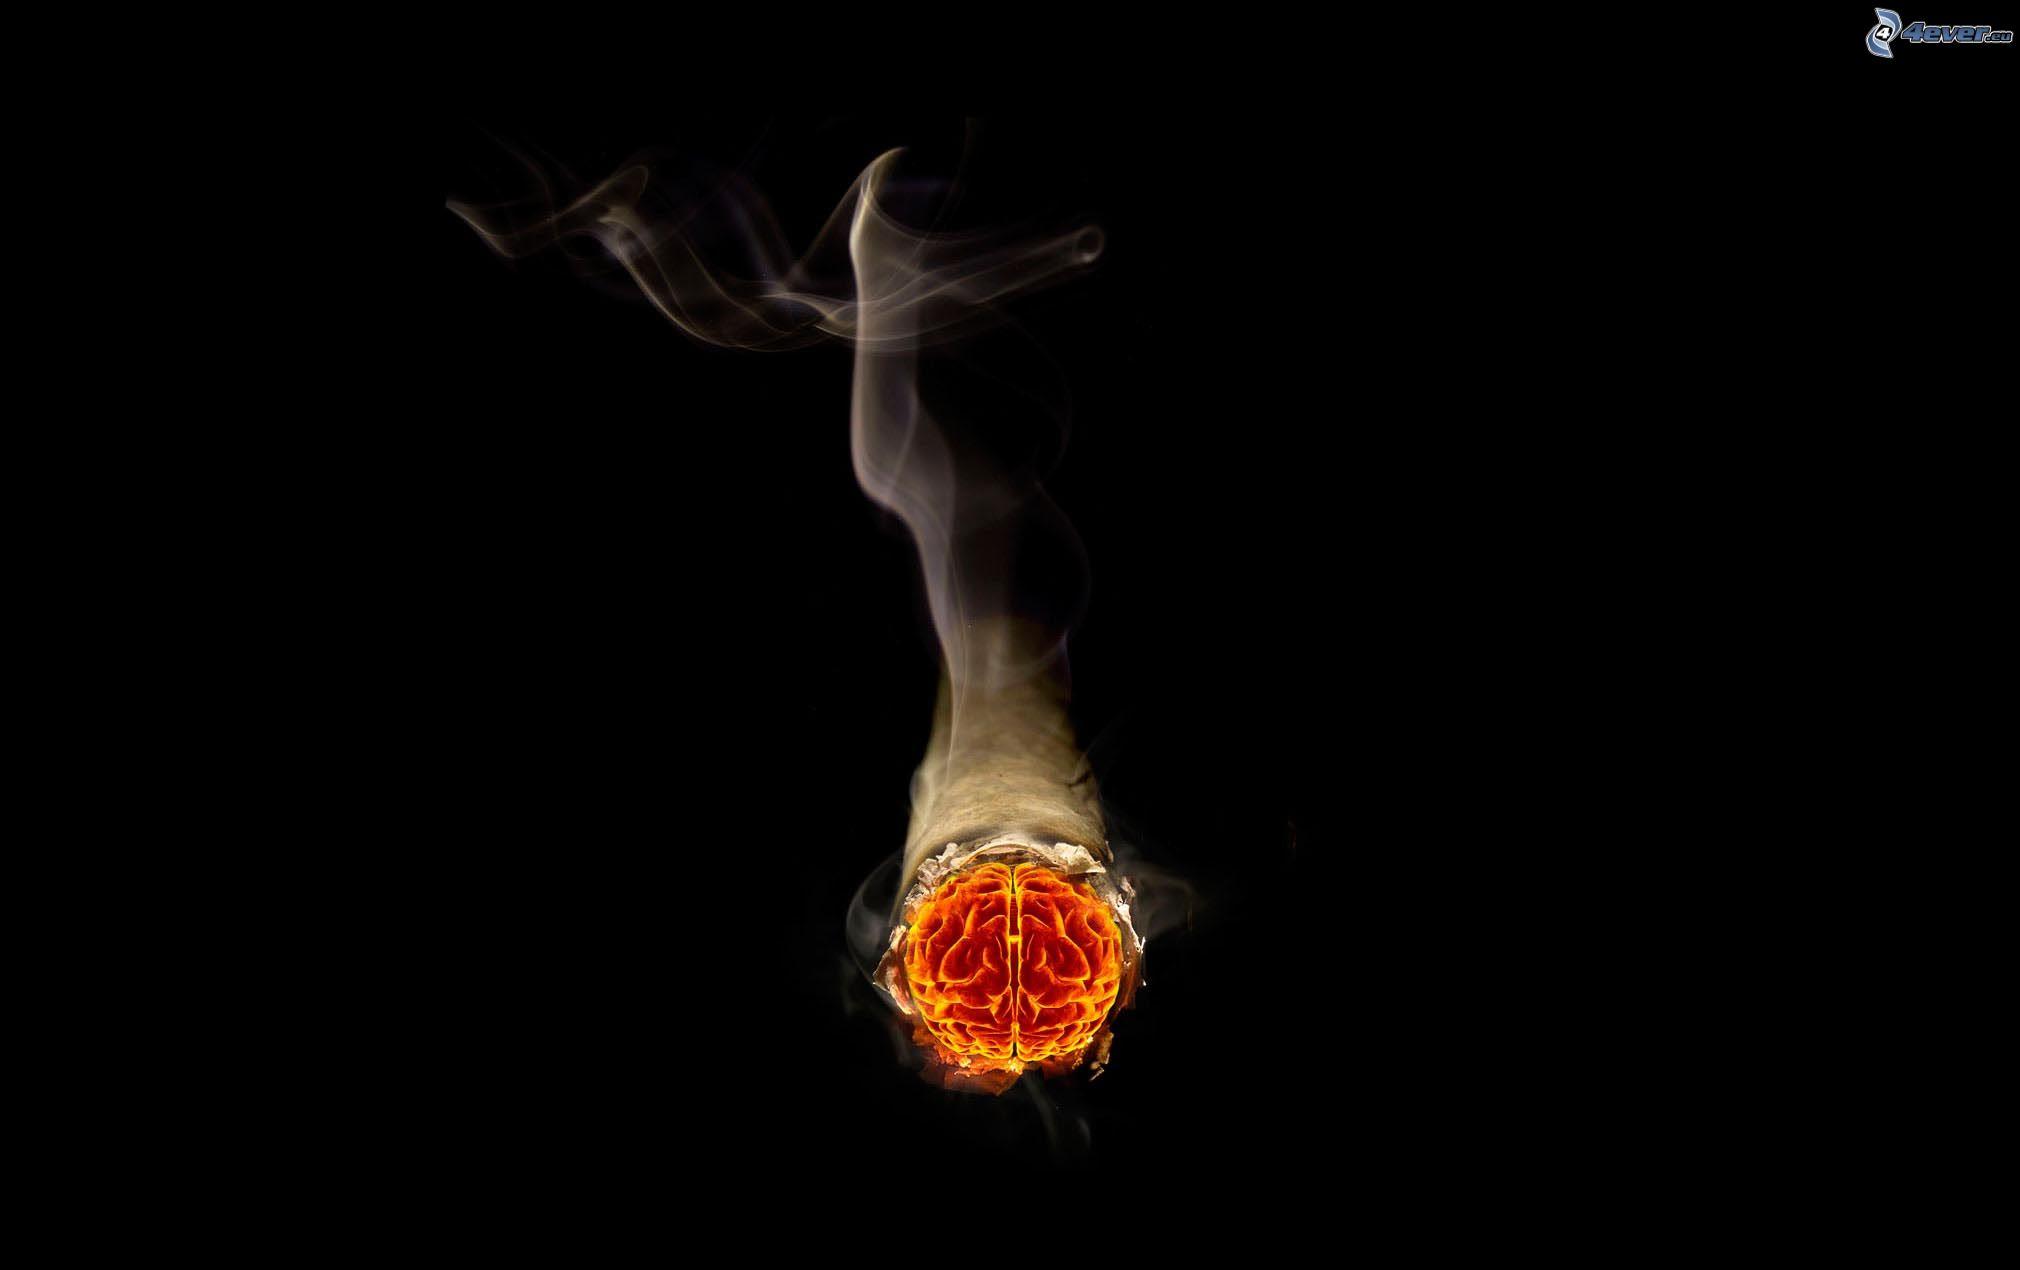 boule de feu wallpaper - photo #11